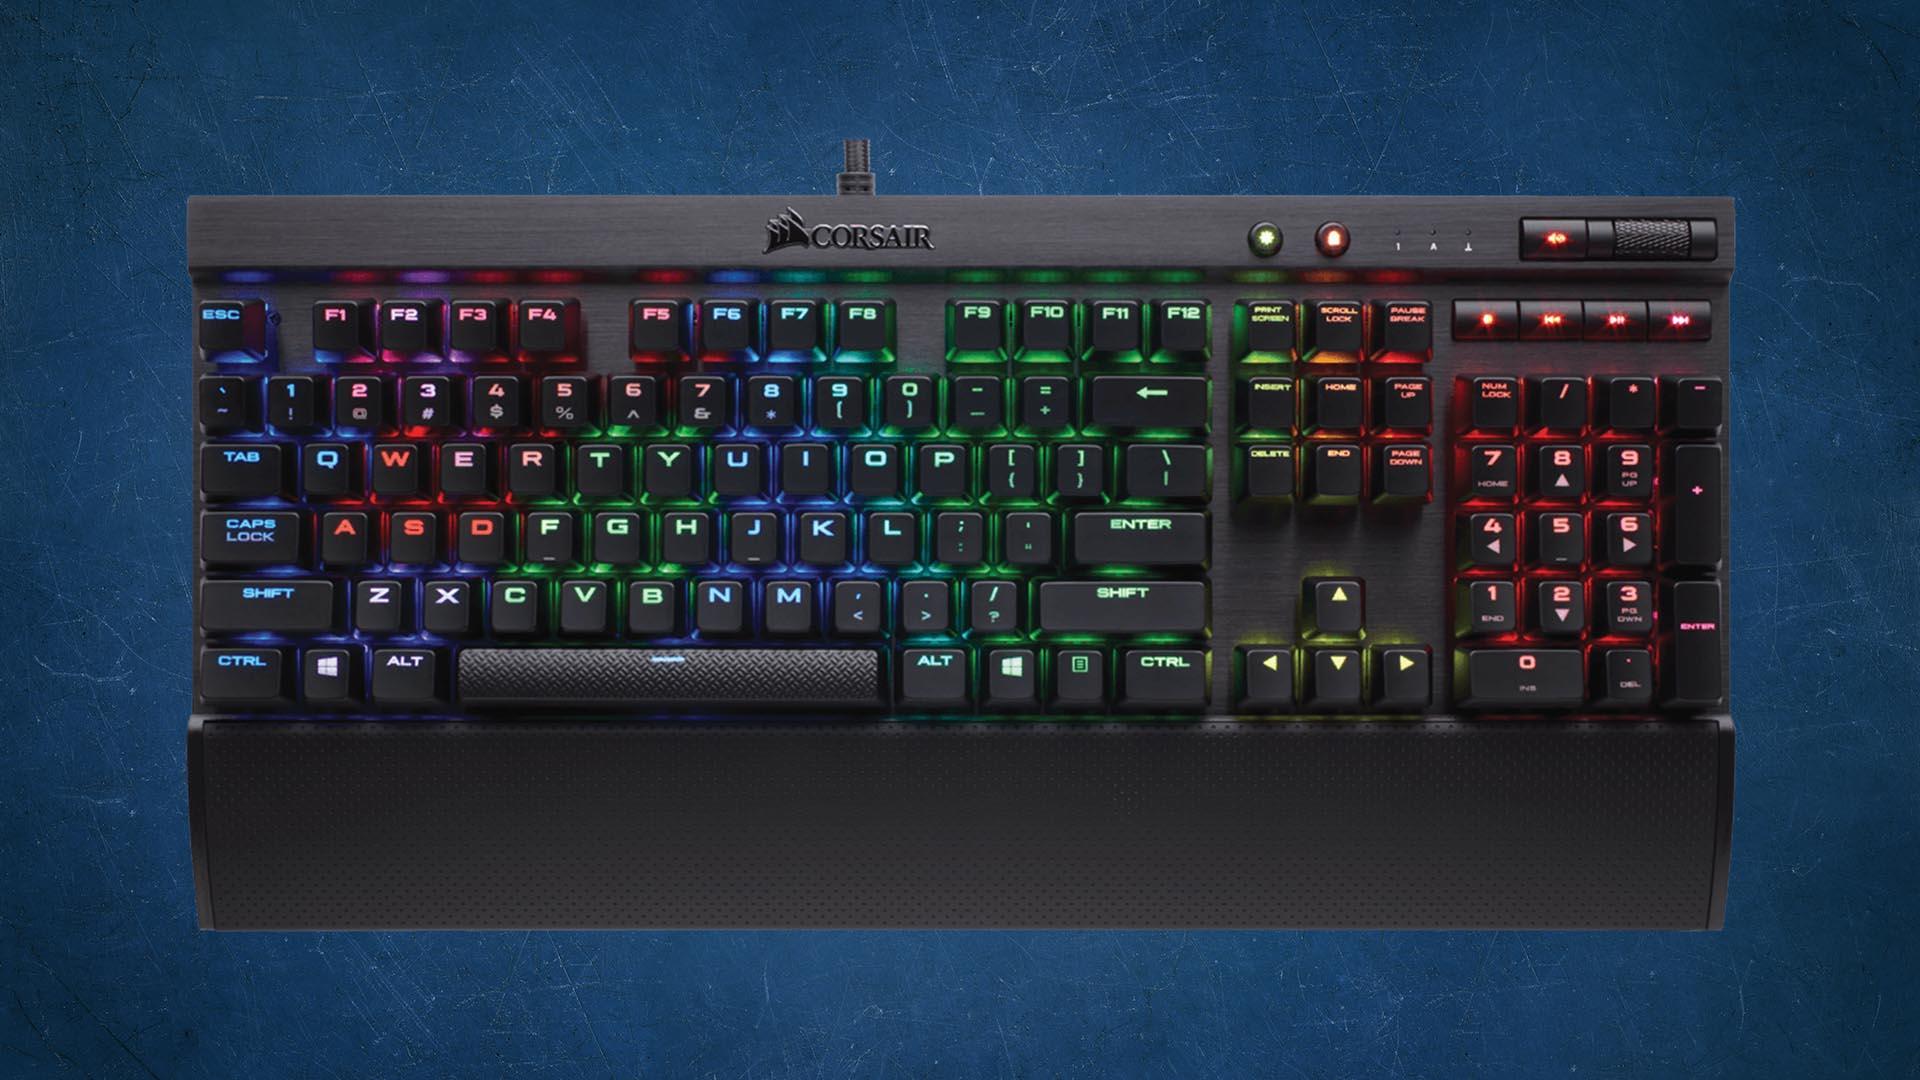 teclados usados por pro players